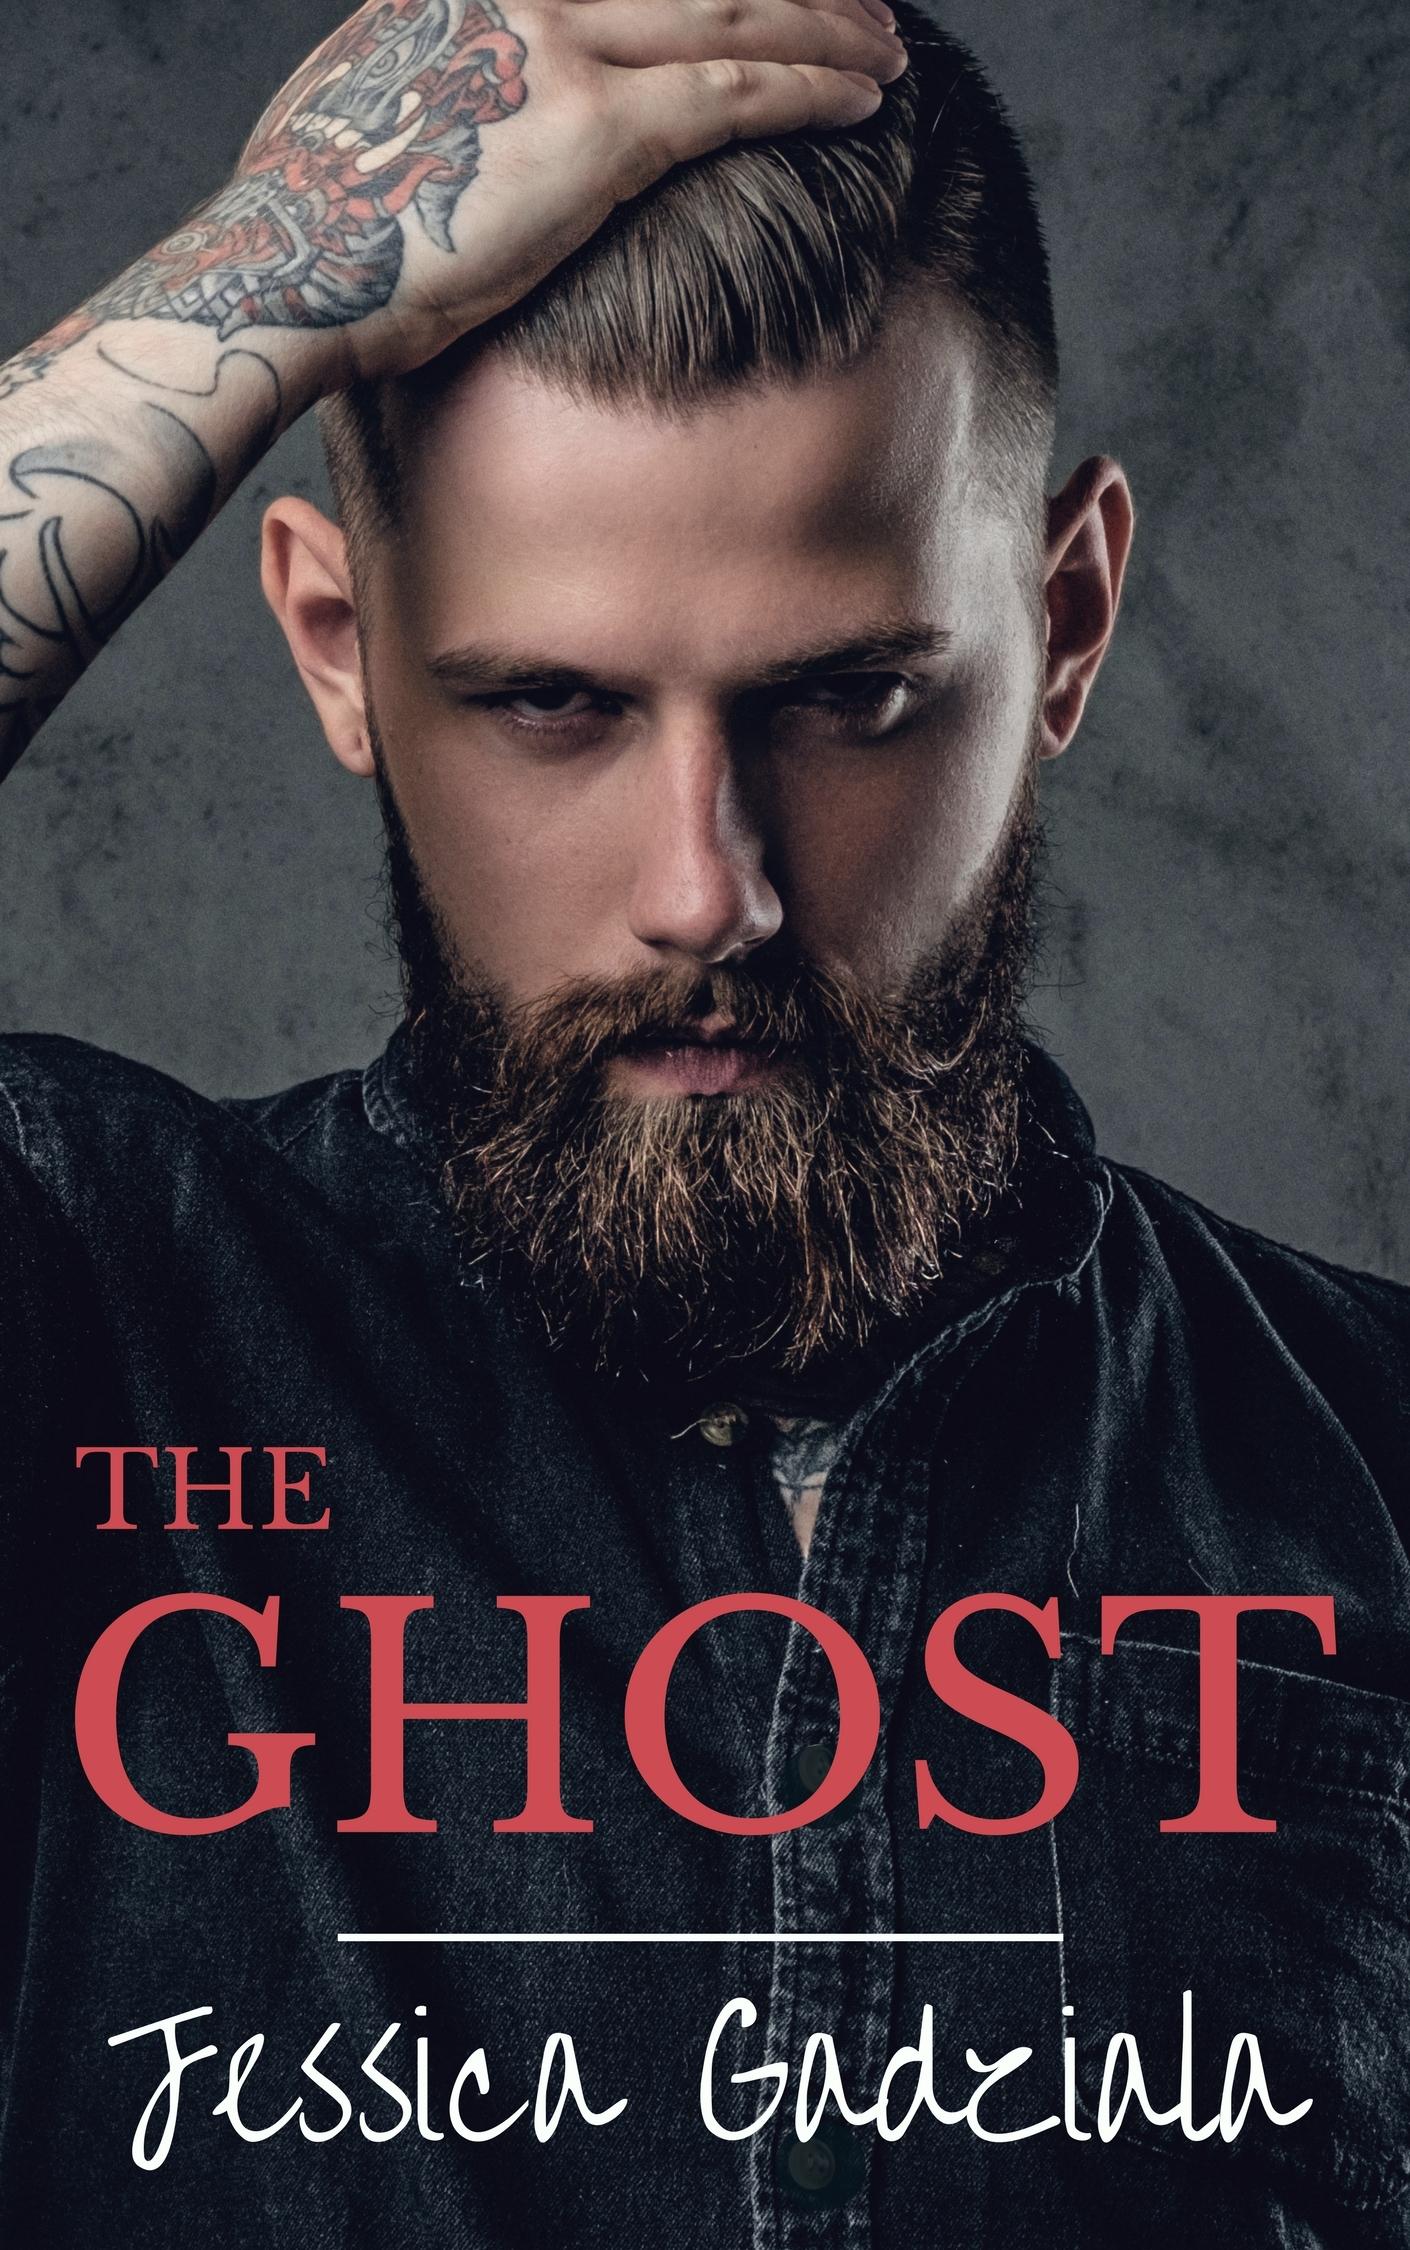 Jessica Gadziala - Professionals 2 - The Ghost